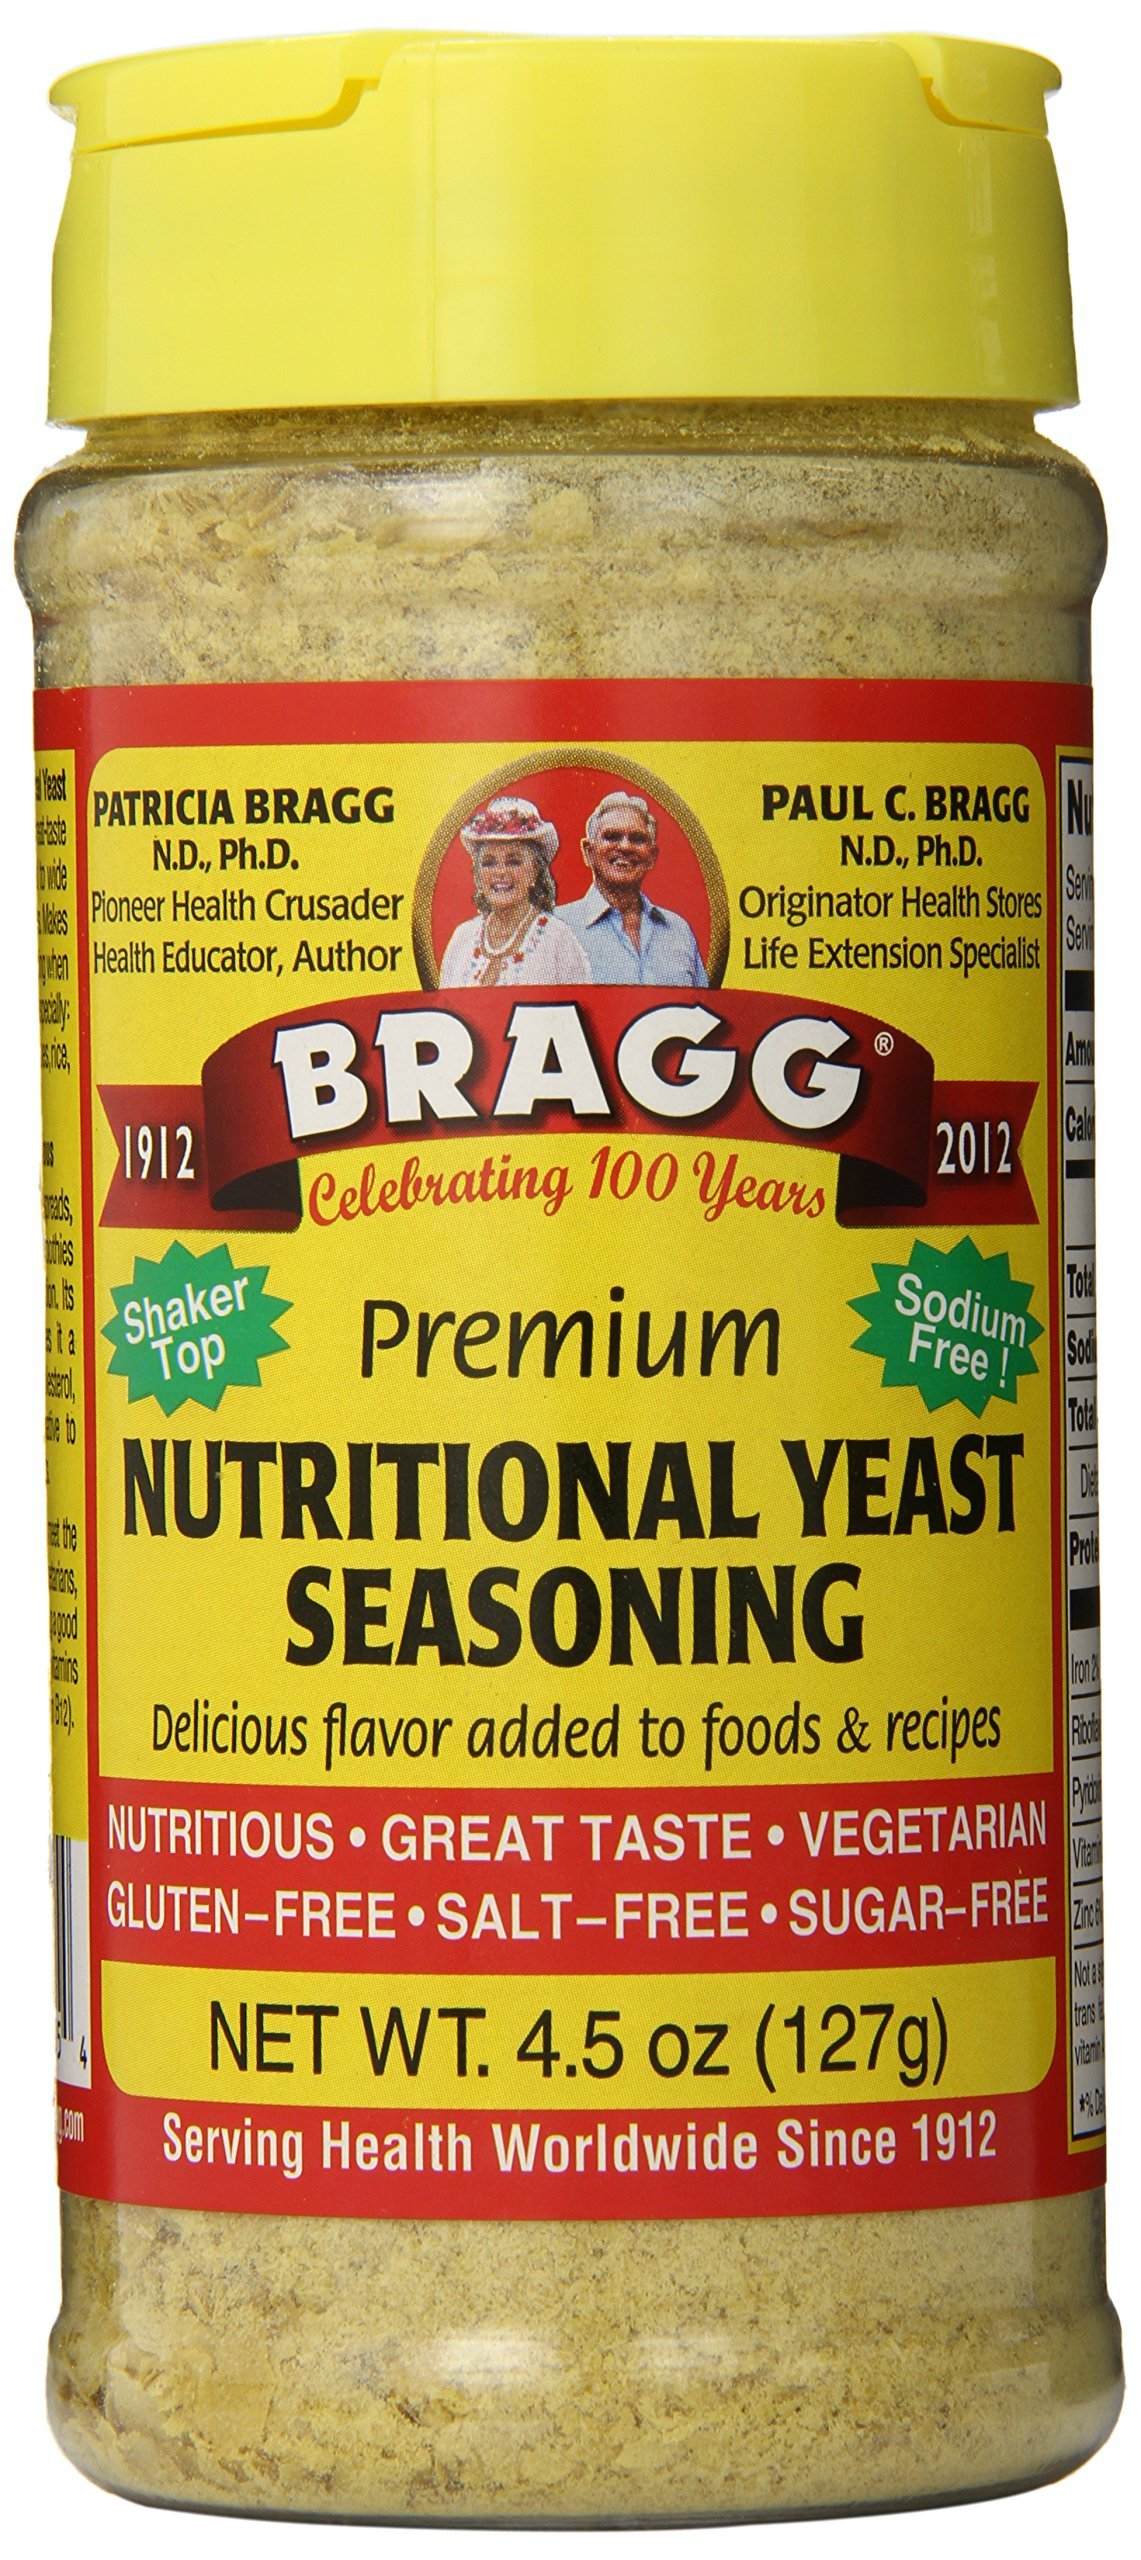 Bragg Premium Nutritional Yeast Seasoning 4.5 Ounce by Bragg (Image #1)